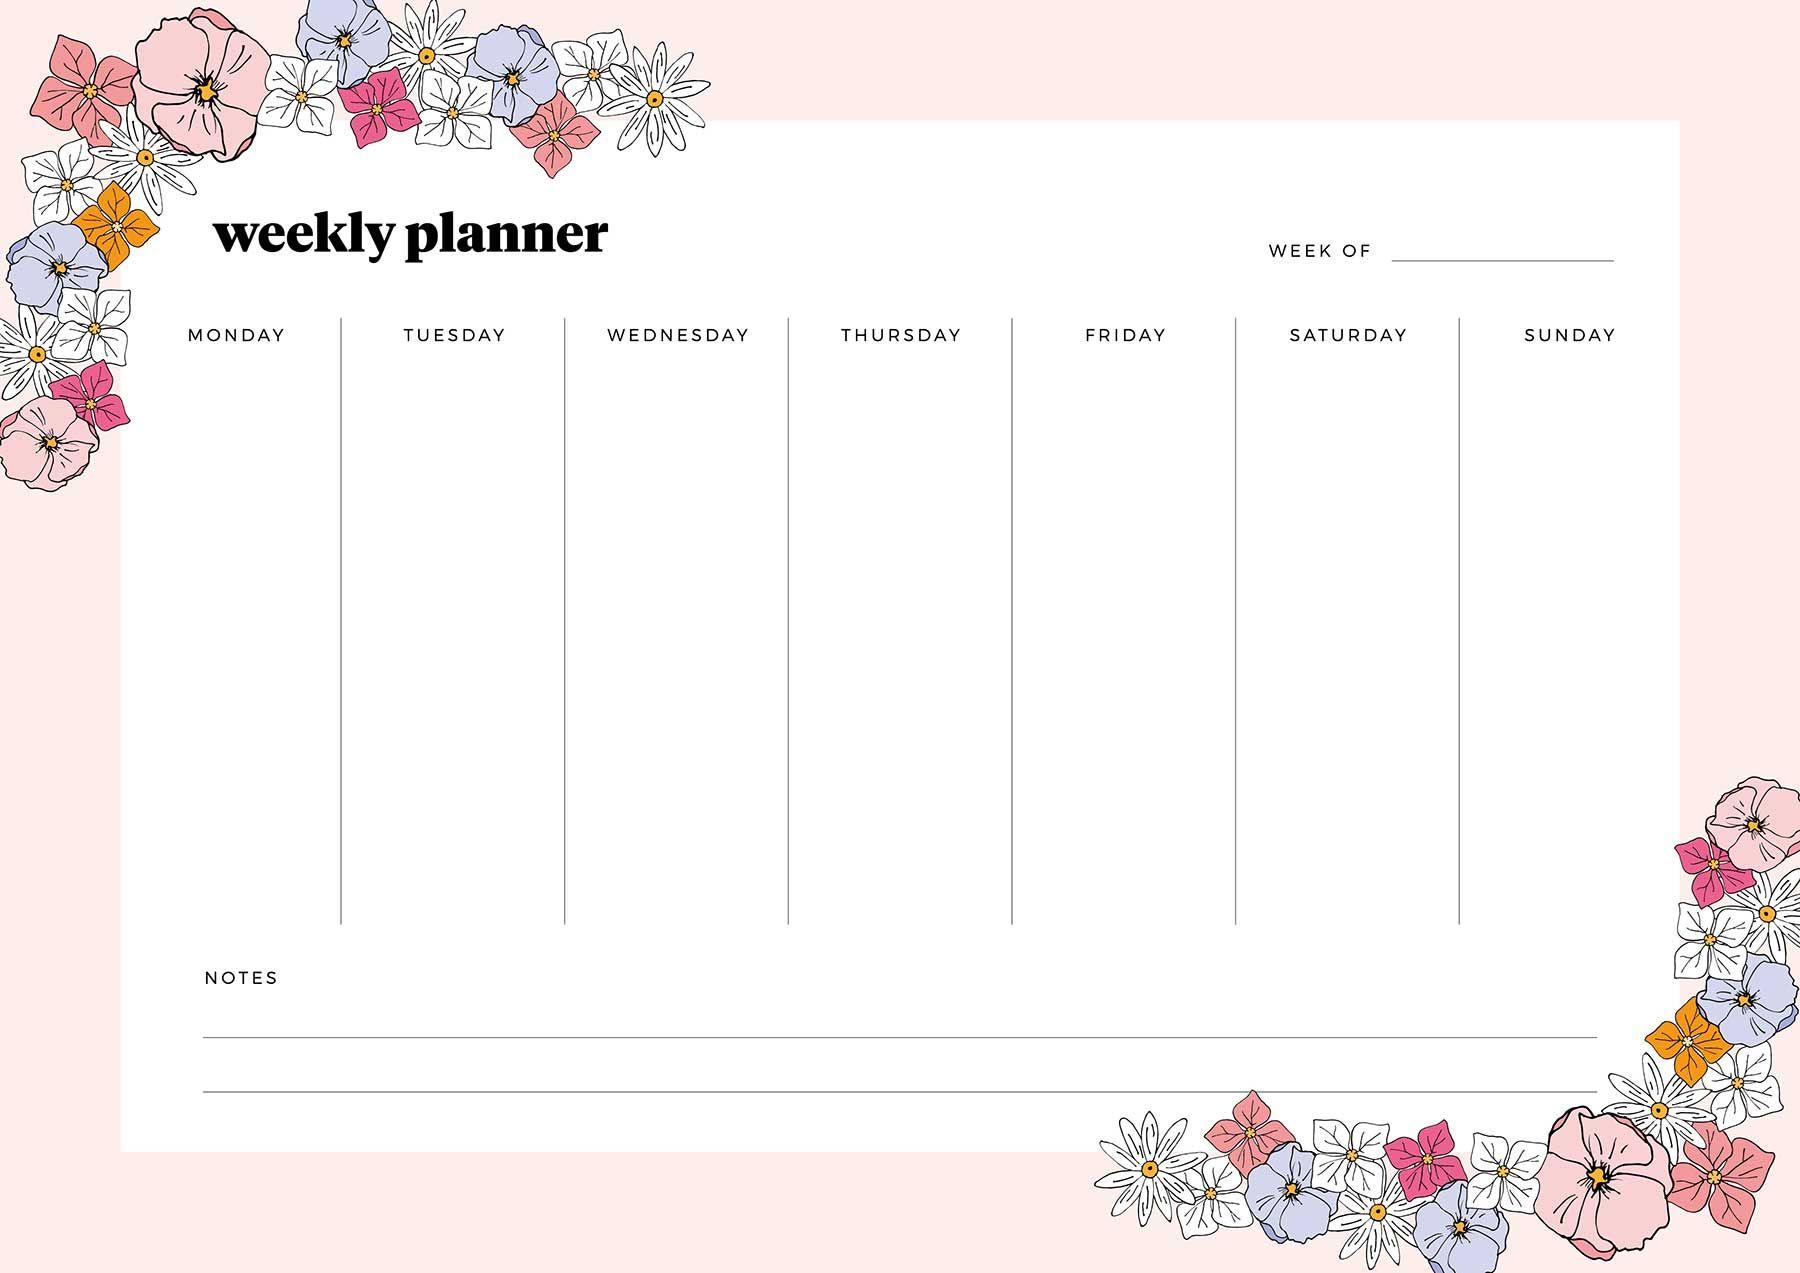 Printable weekly planner   Weekly planner, Weekly planner ...